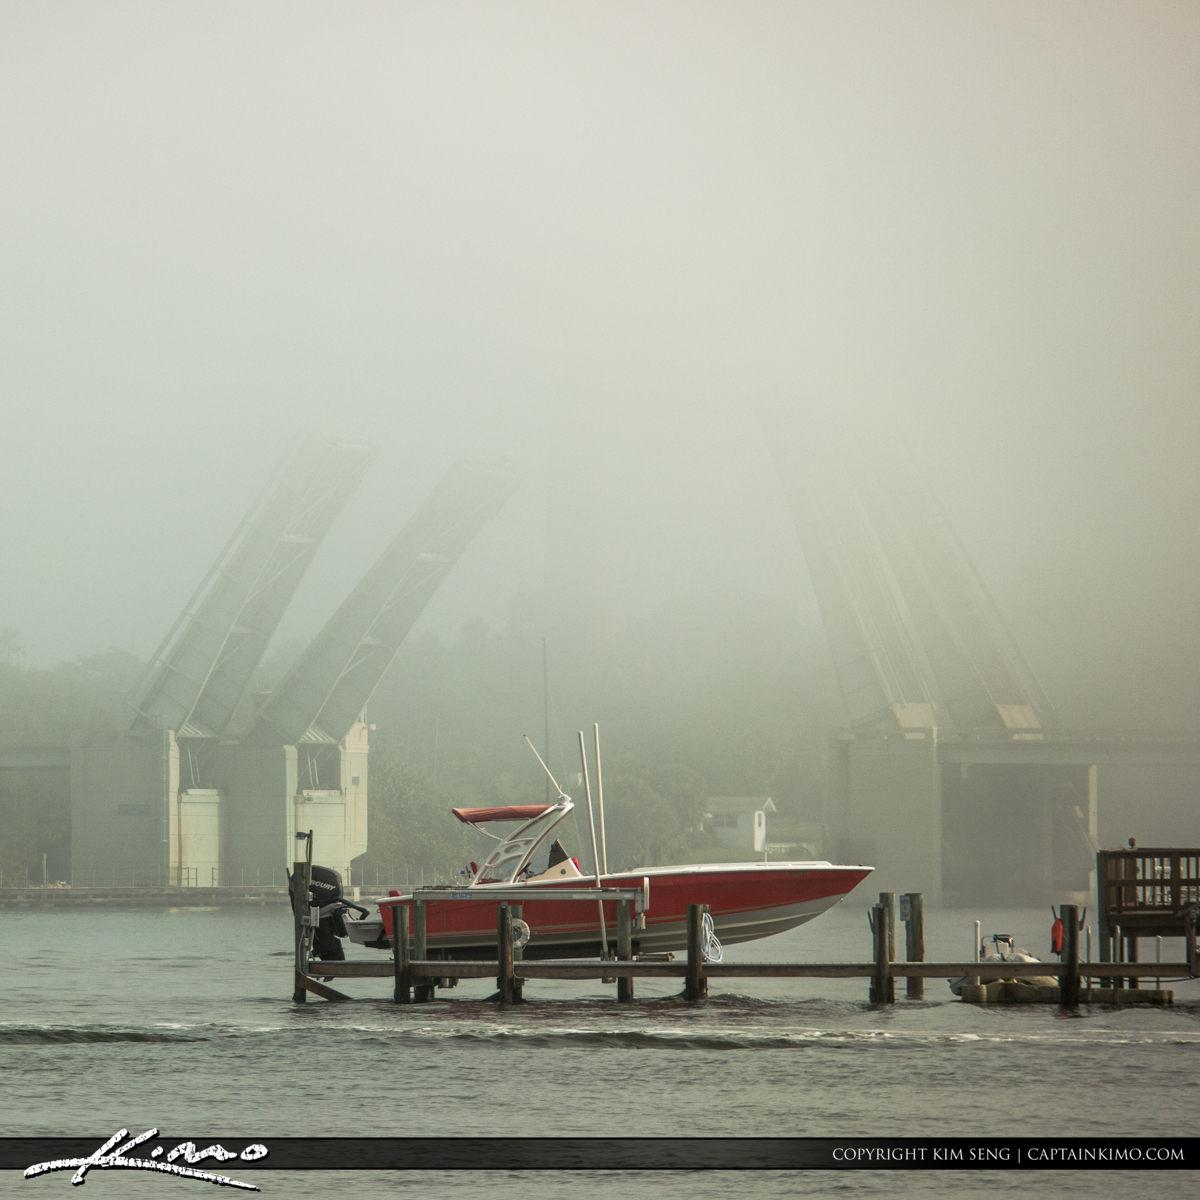 Jupiter Lighthouse US 1 Bridge Fog